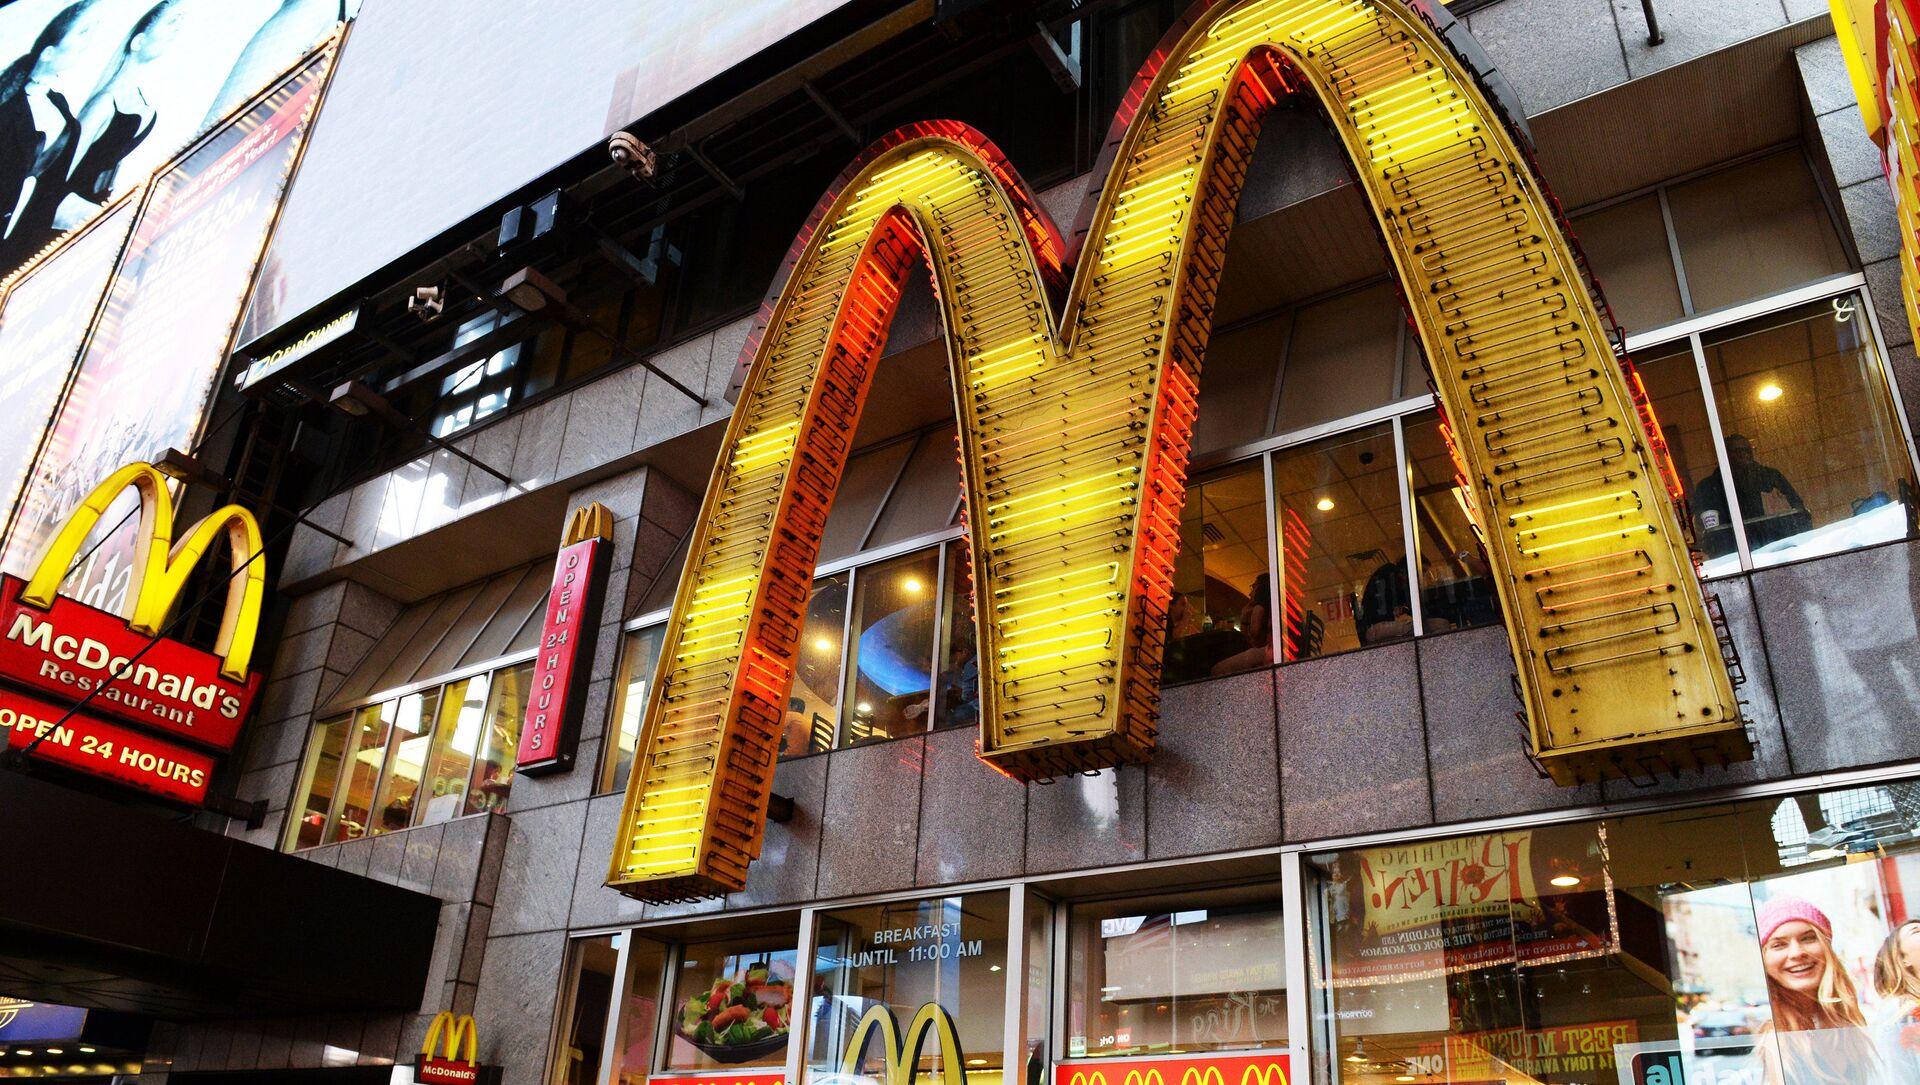 Un McDonald's - Sputnik France, 1920, 02.09.2021